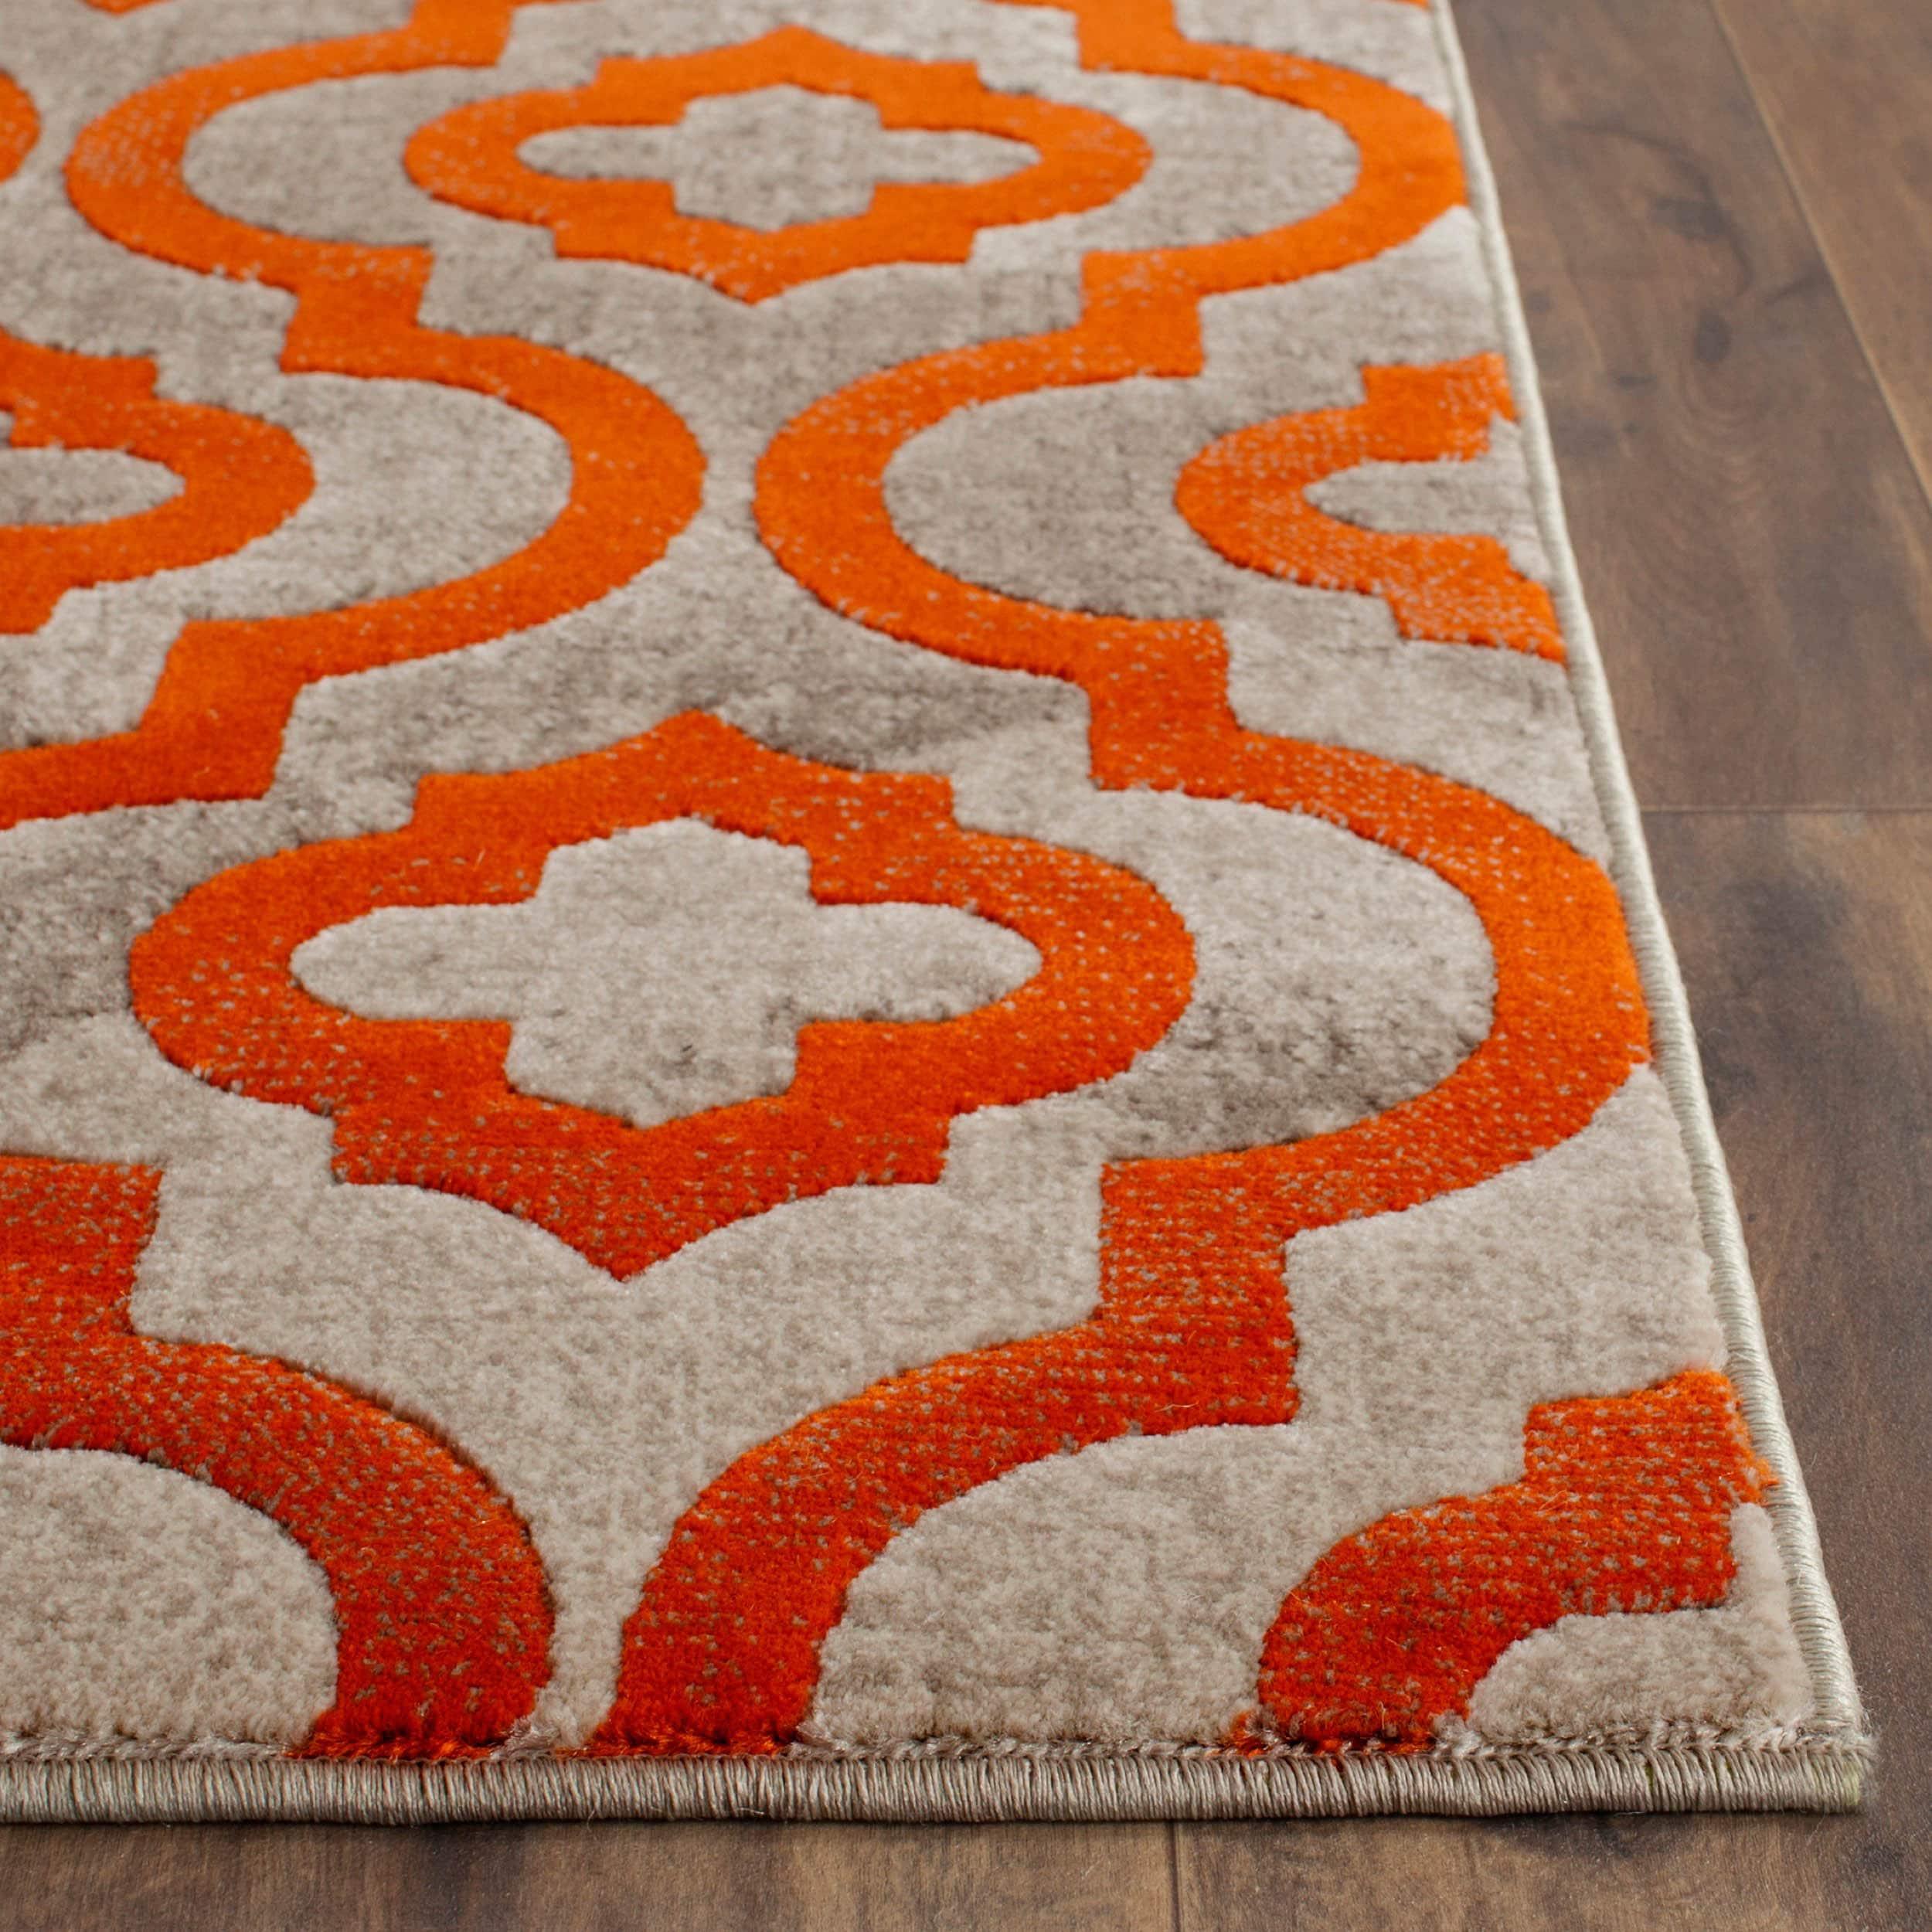 safavieh porcello contemporary moroccan light grey orange rug (' square) free shipping today  overstockcom  . safavieh porcello contemporary moroccan light grey orange rug (